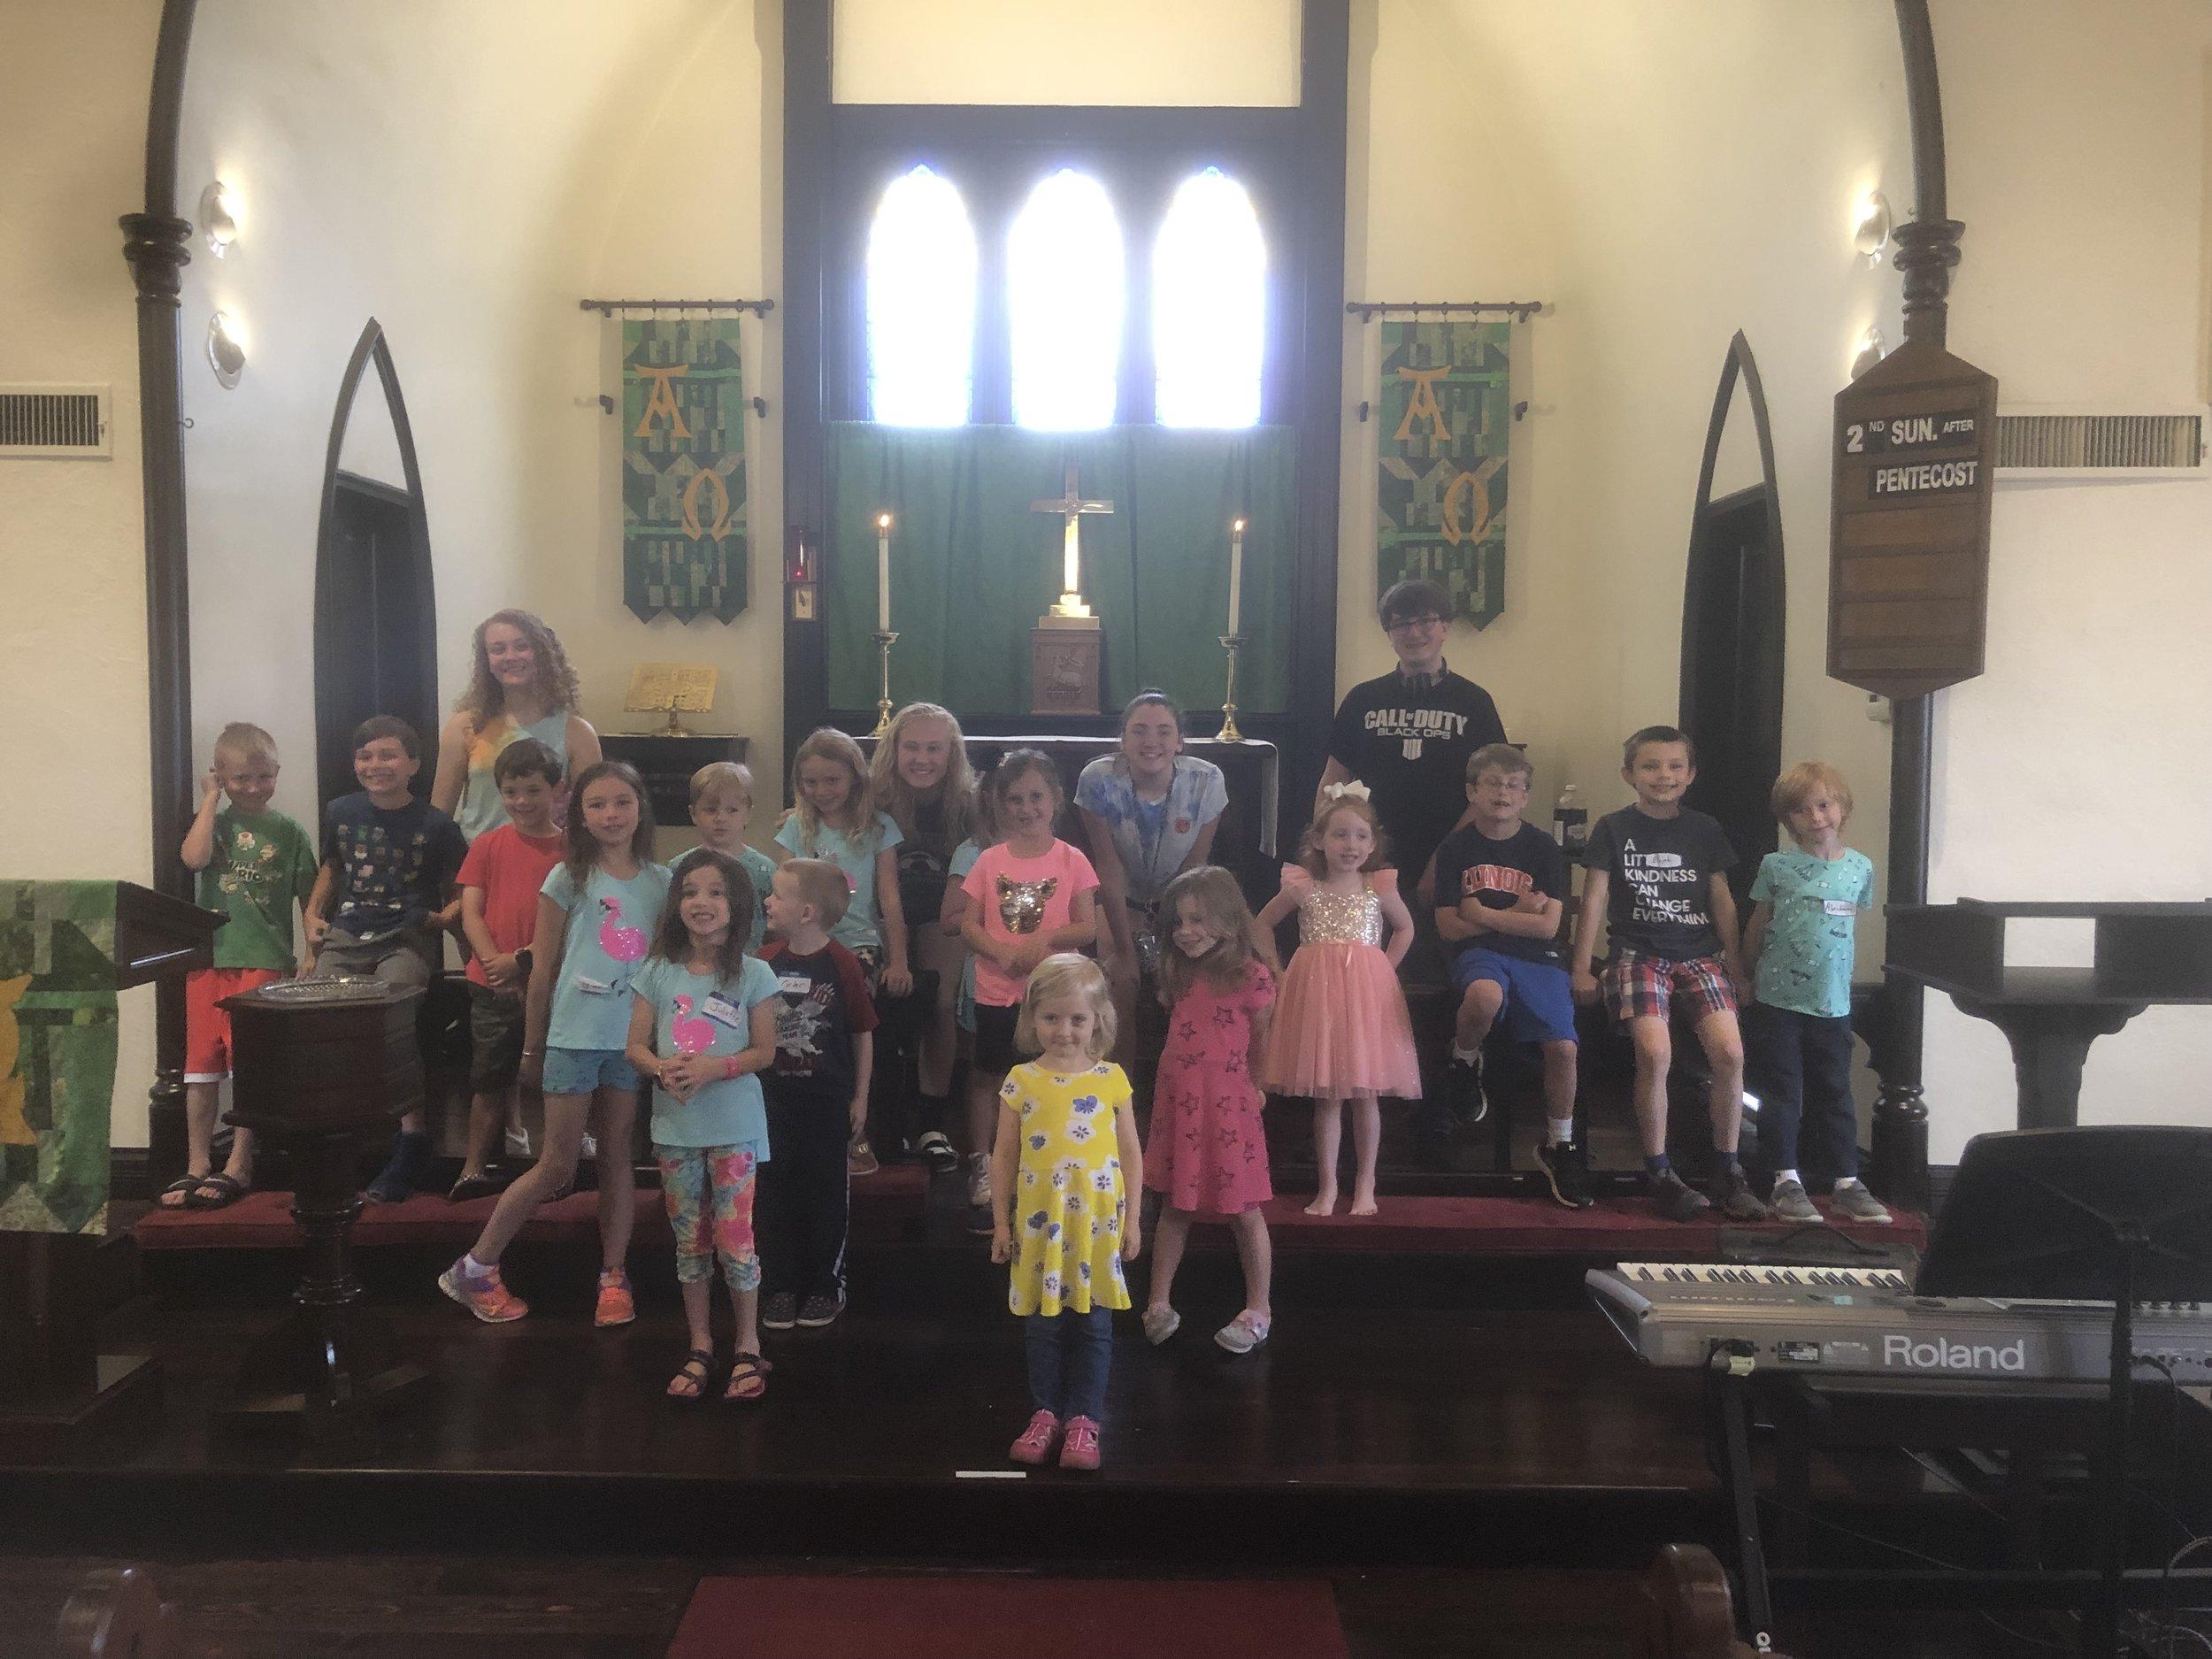 VBS 2019 - We had 18 children and four teen volunteers!